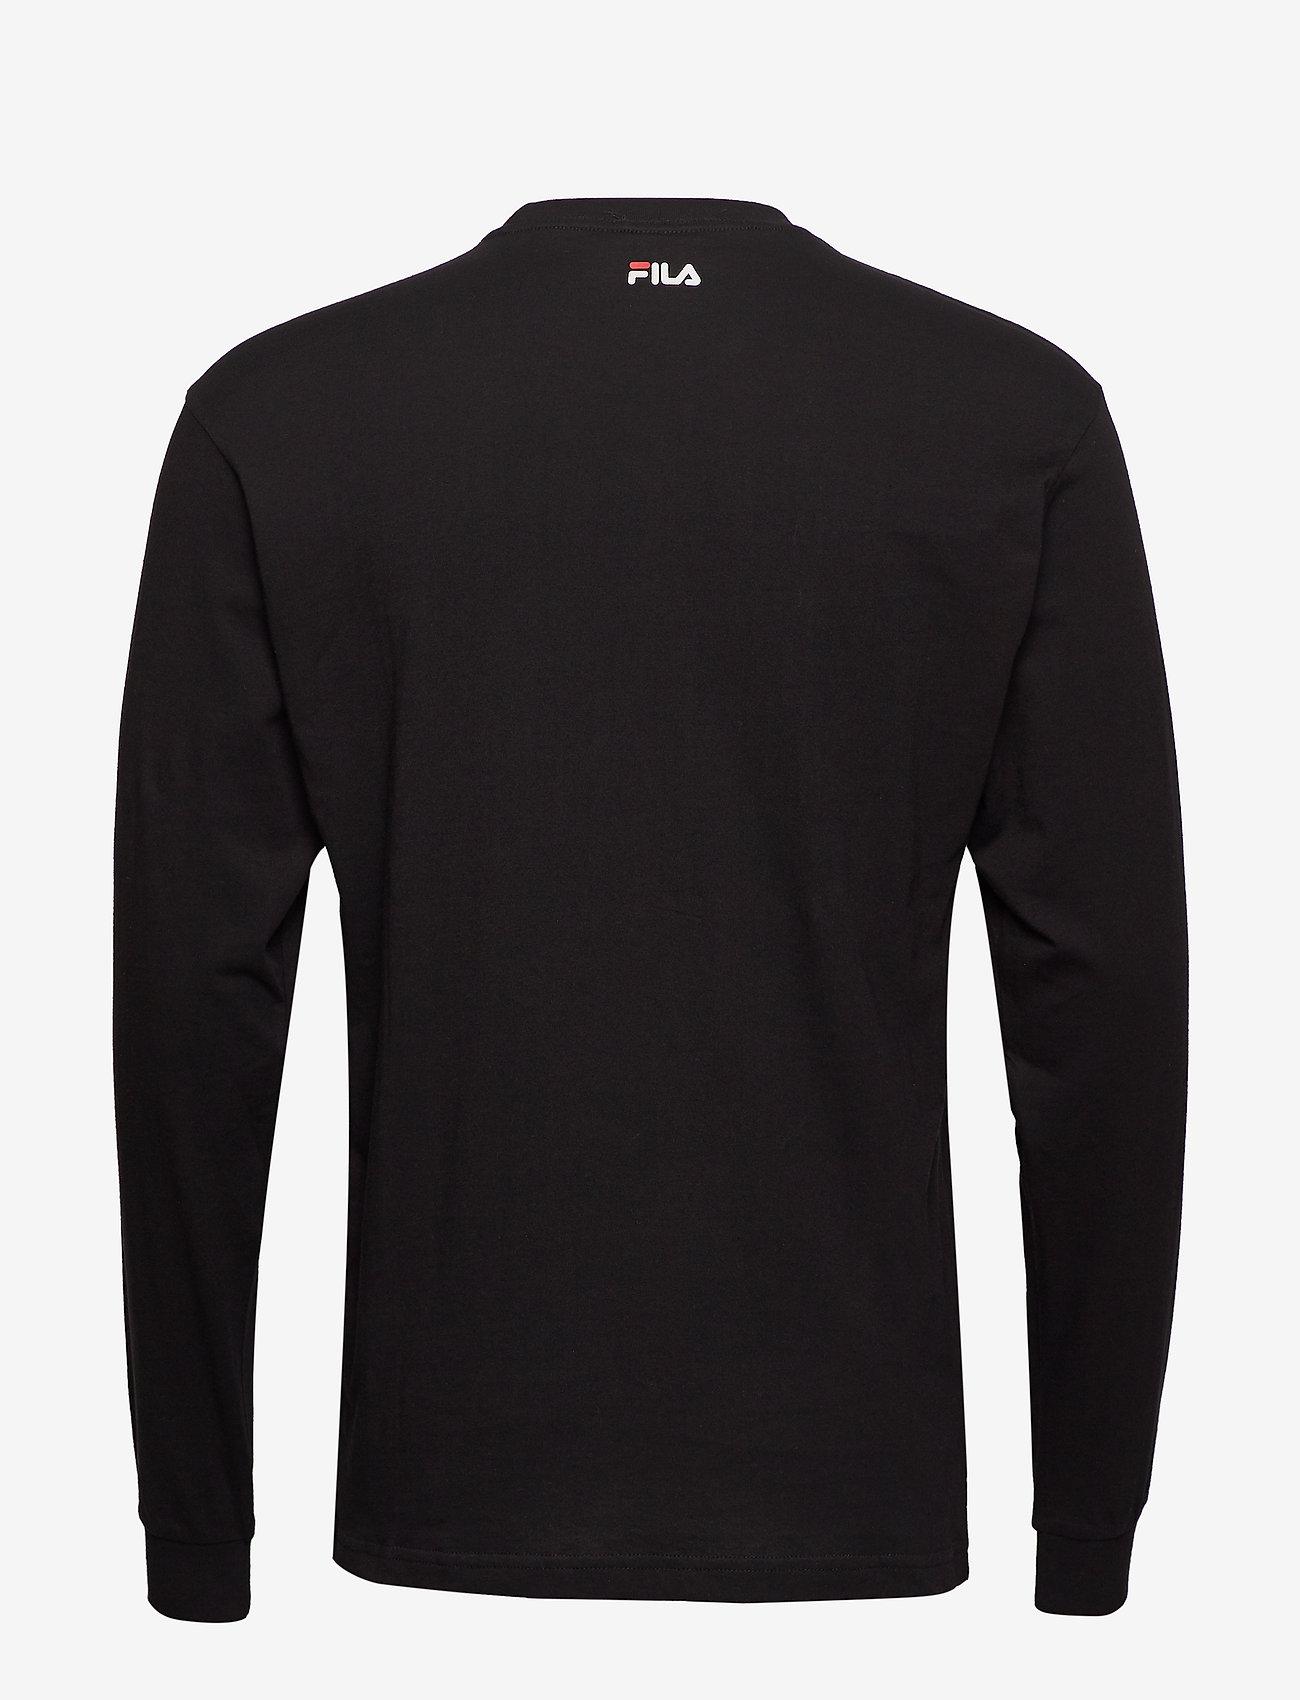 FILA - UNISEX CLASSIC PURE long sleeve shirt - hauts à manches longues - black - 1